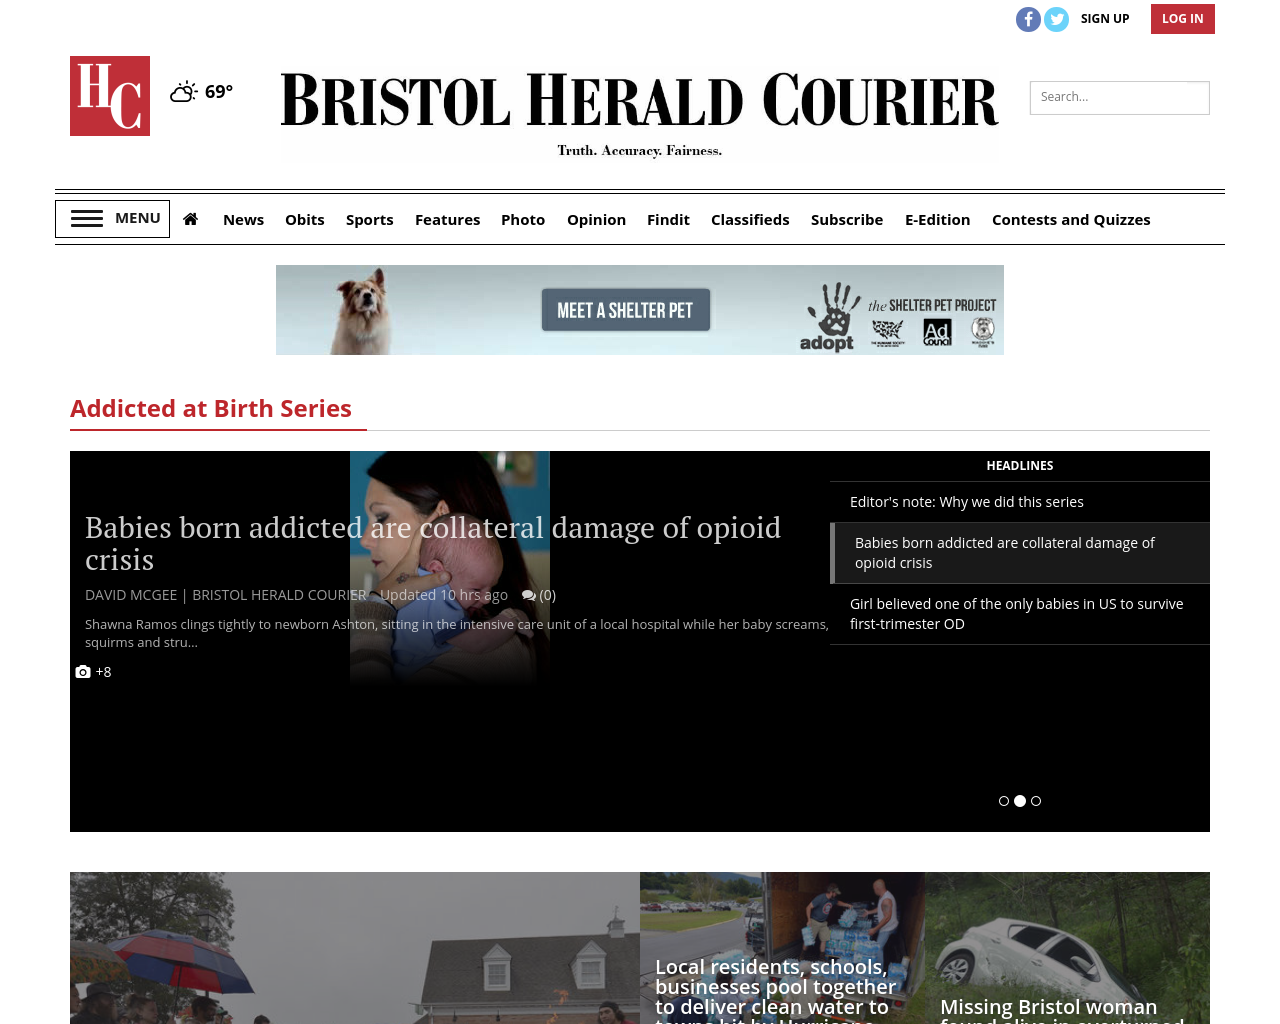 HeraldCourier.com-Advertising-Reviews-Pricing